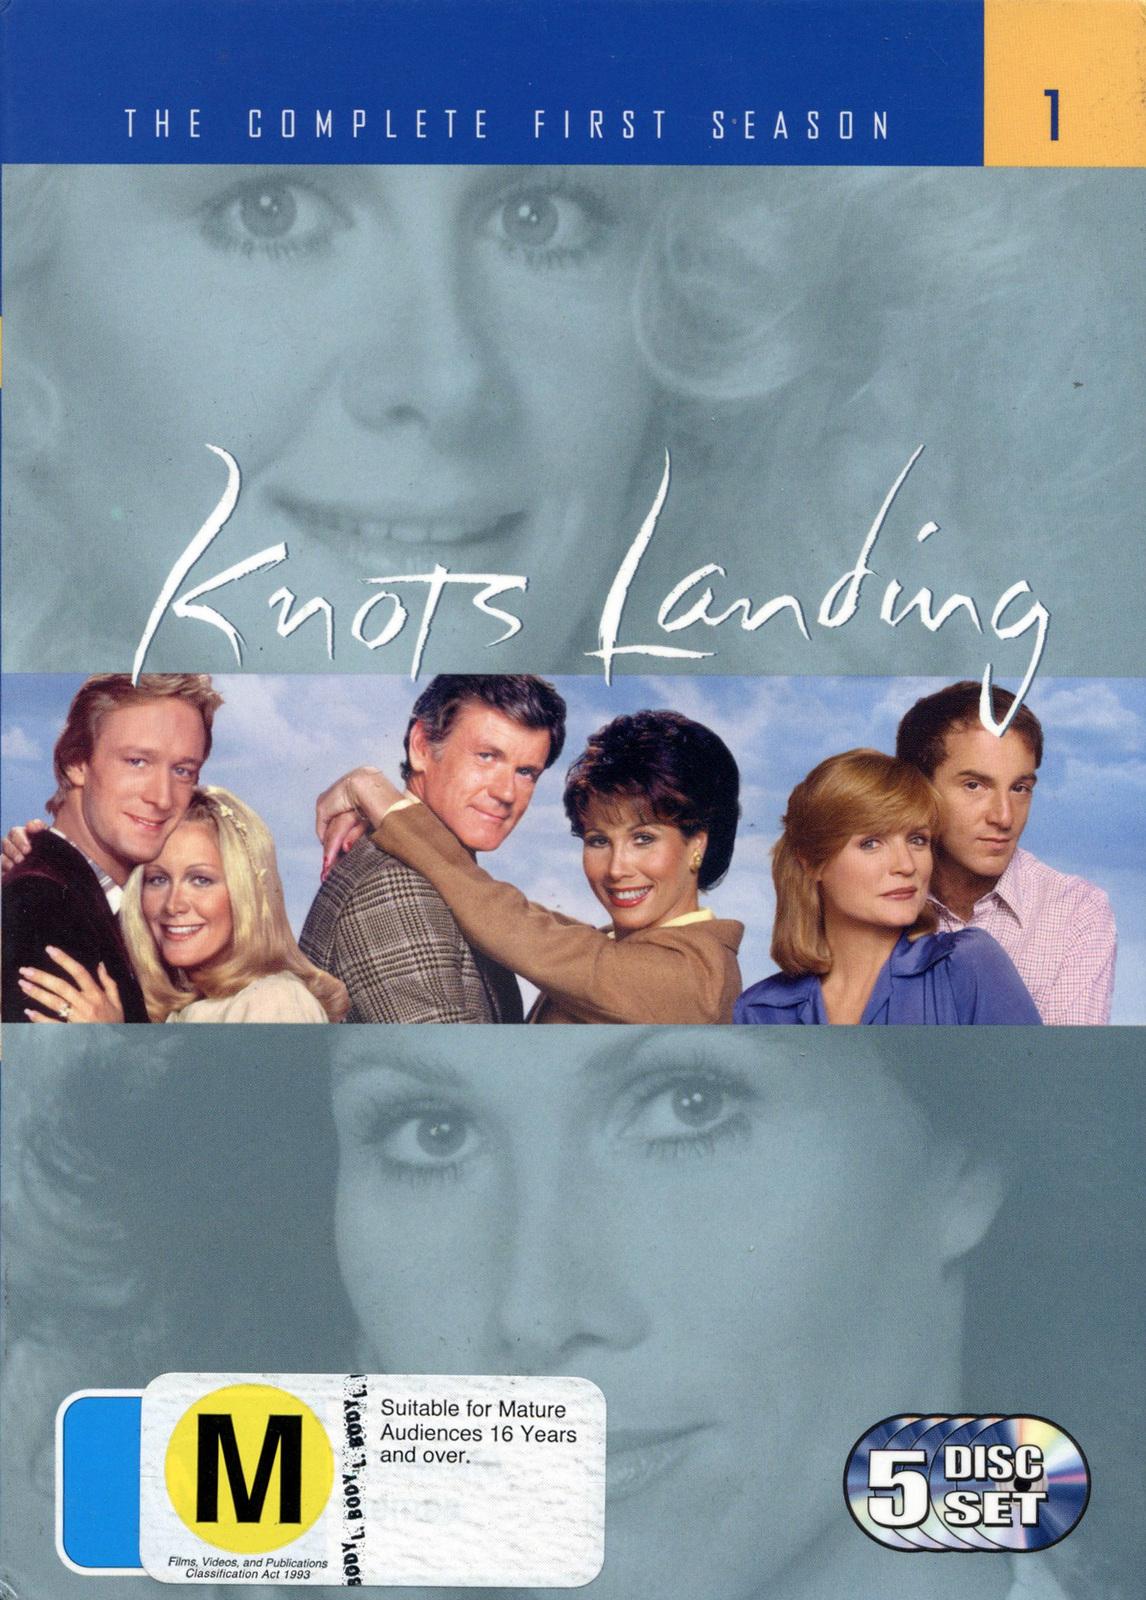 Knots Landing - Complete Season 1 (5 Disc Set) on DVD image